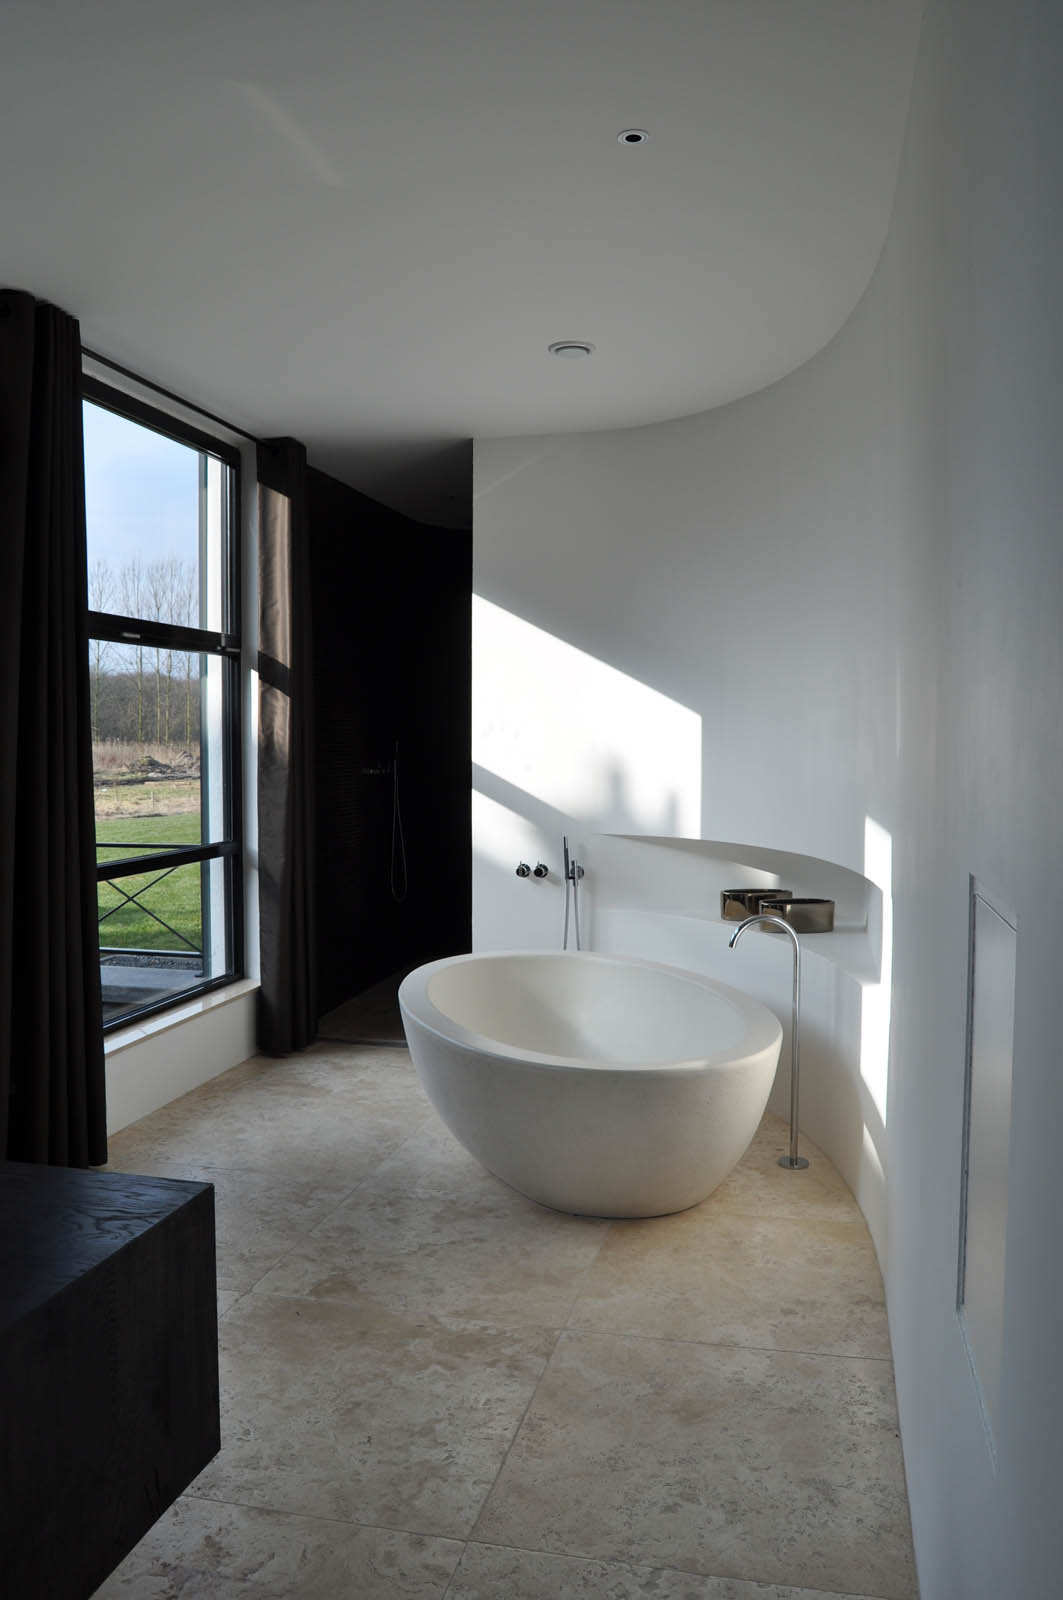 Bathroom, Villa Heiloo by Jeroen de Nijs